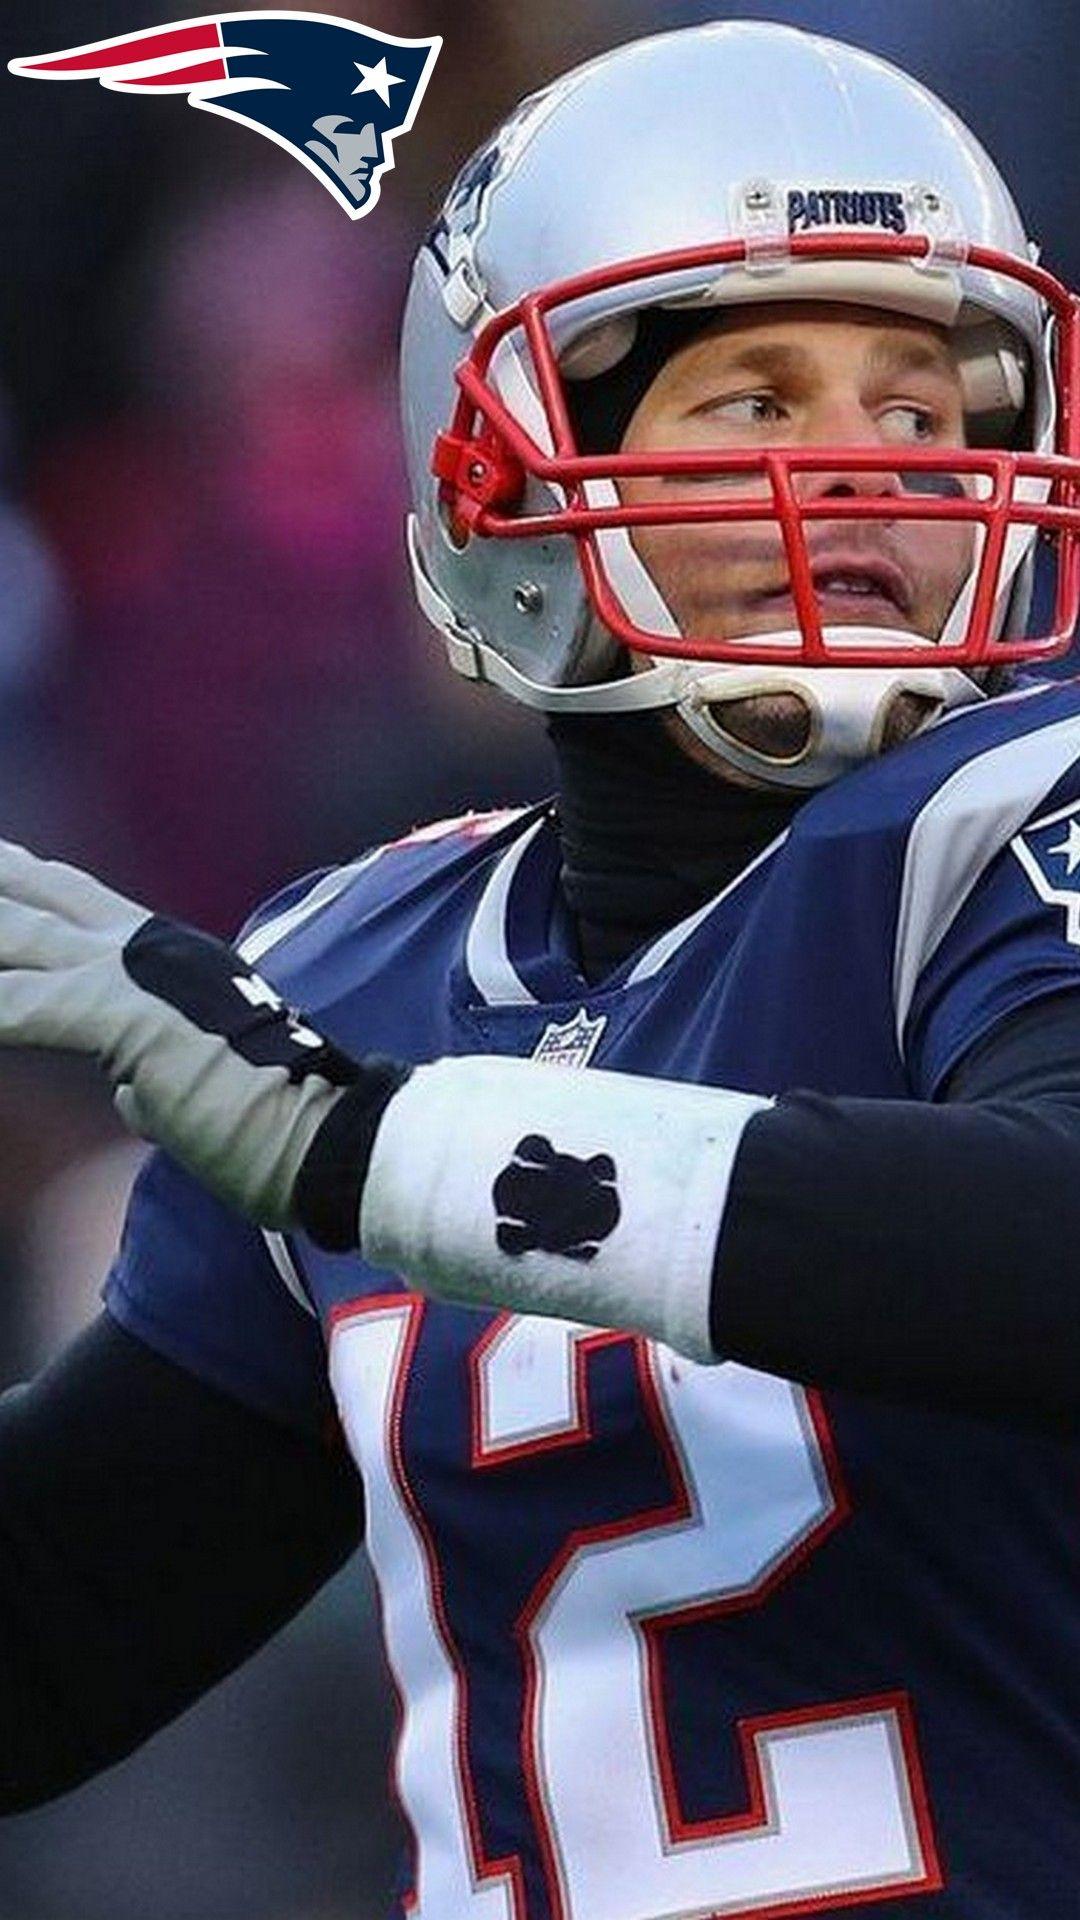 Tom Brady Wallpaper Iphone Hd 2021 Nfl Football Wallpapers Tom Brady Wallpaper Nfl Football Wallpaper Tom Brady